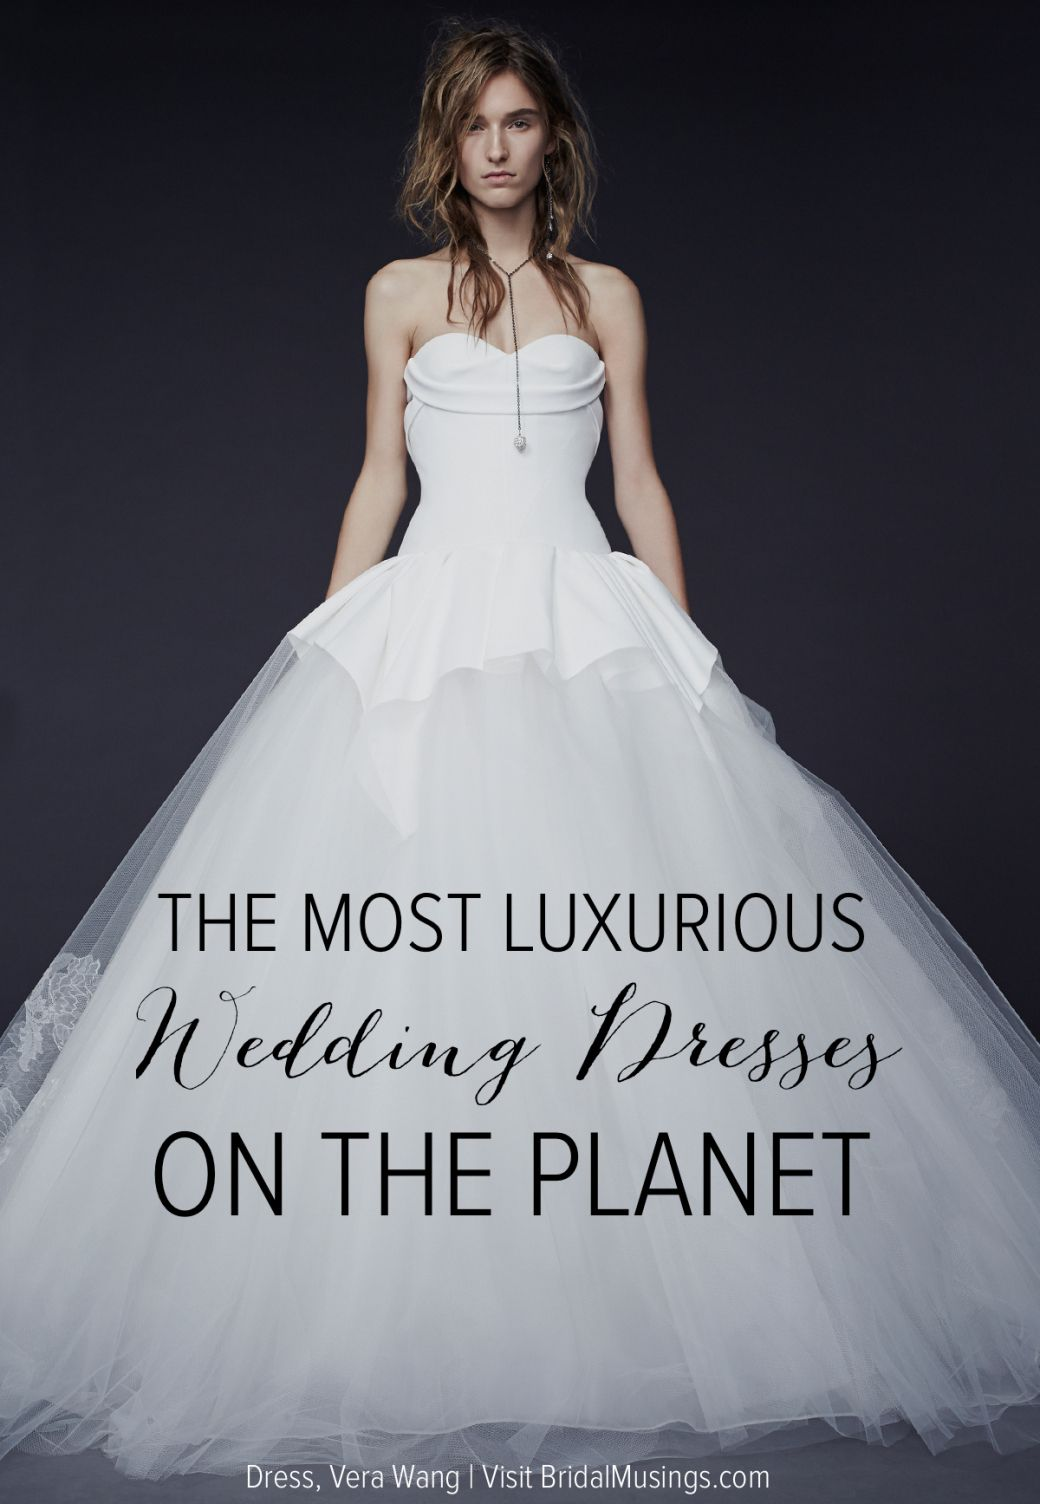 Vera Wang Designer Wedding Dresses - Dresses for Wedding Reception ...